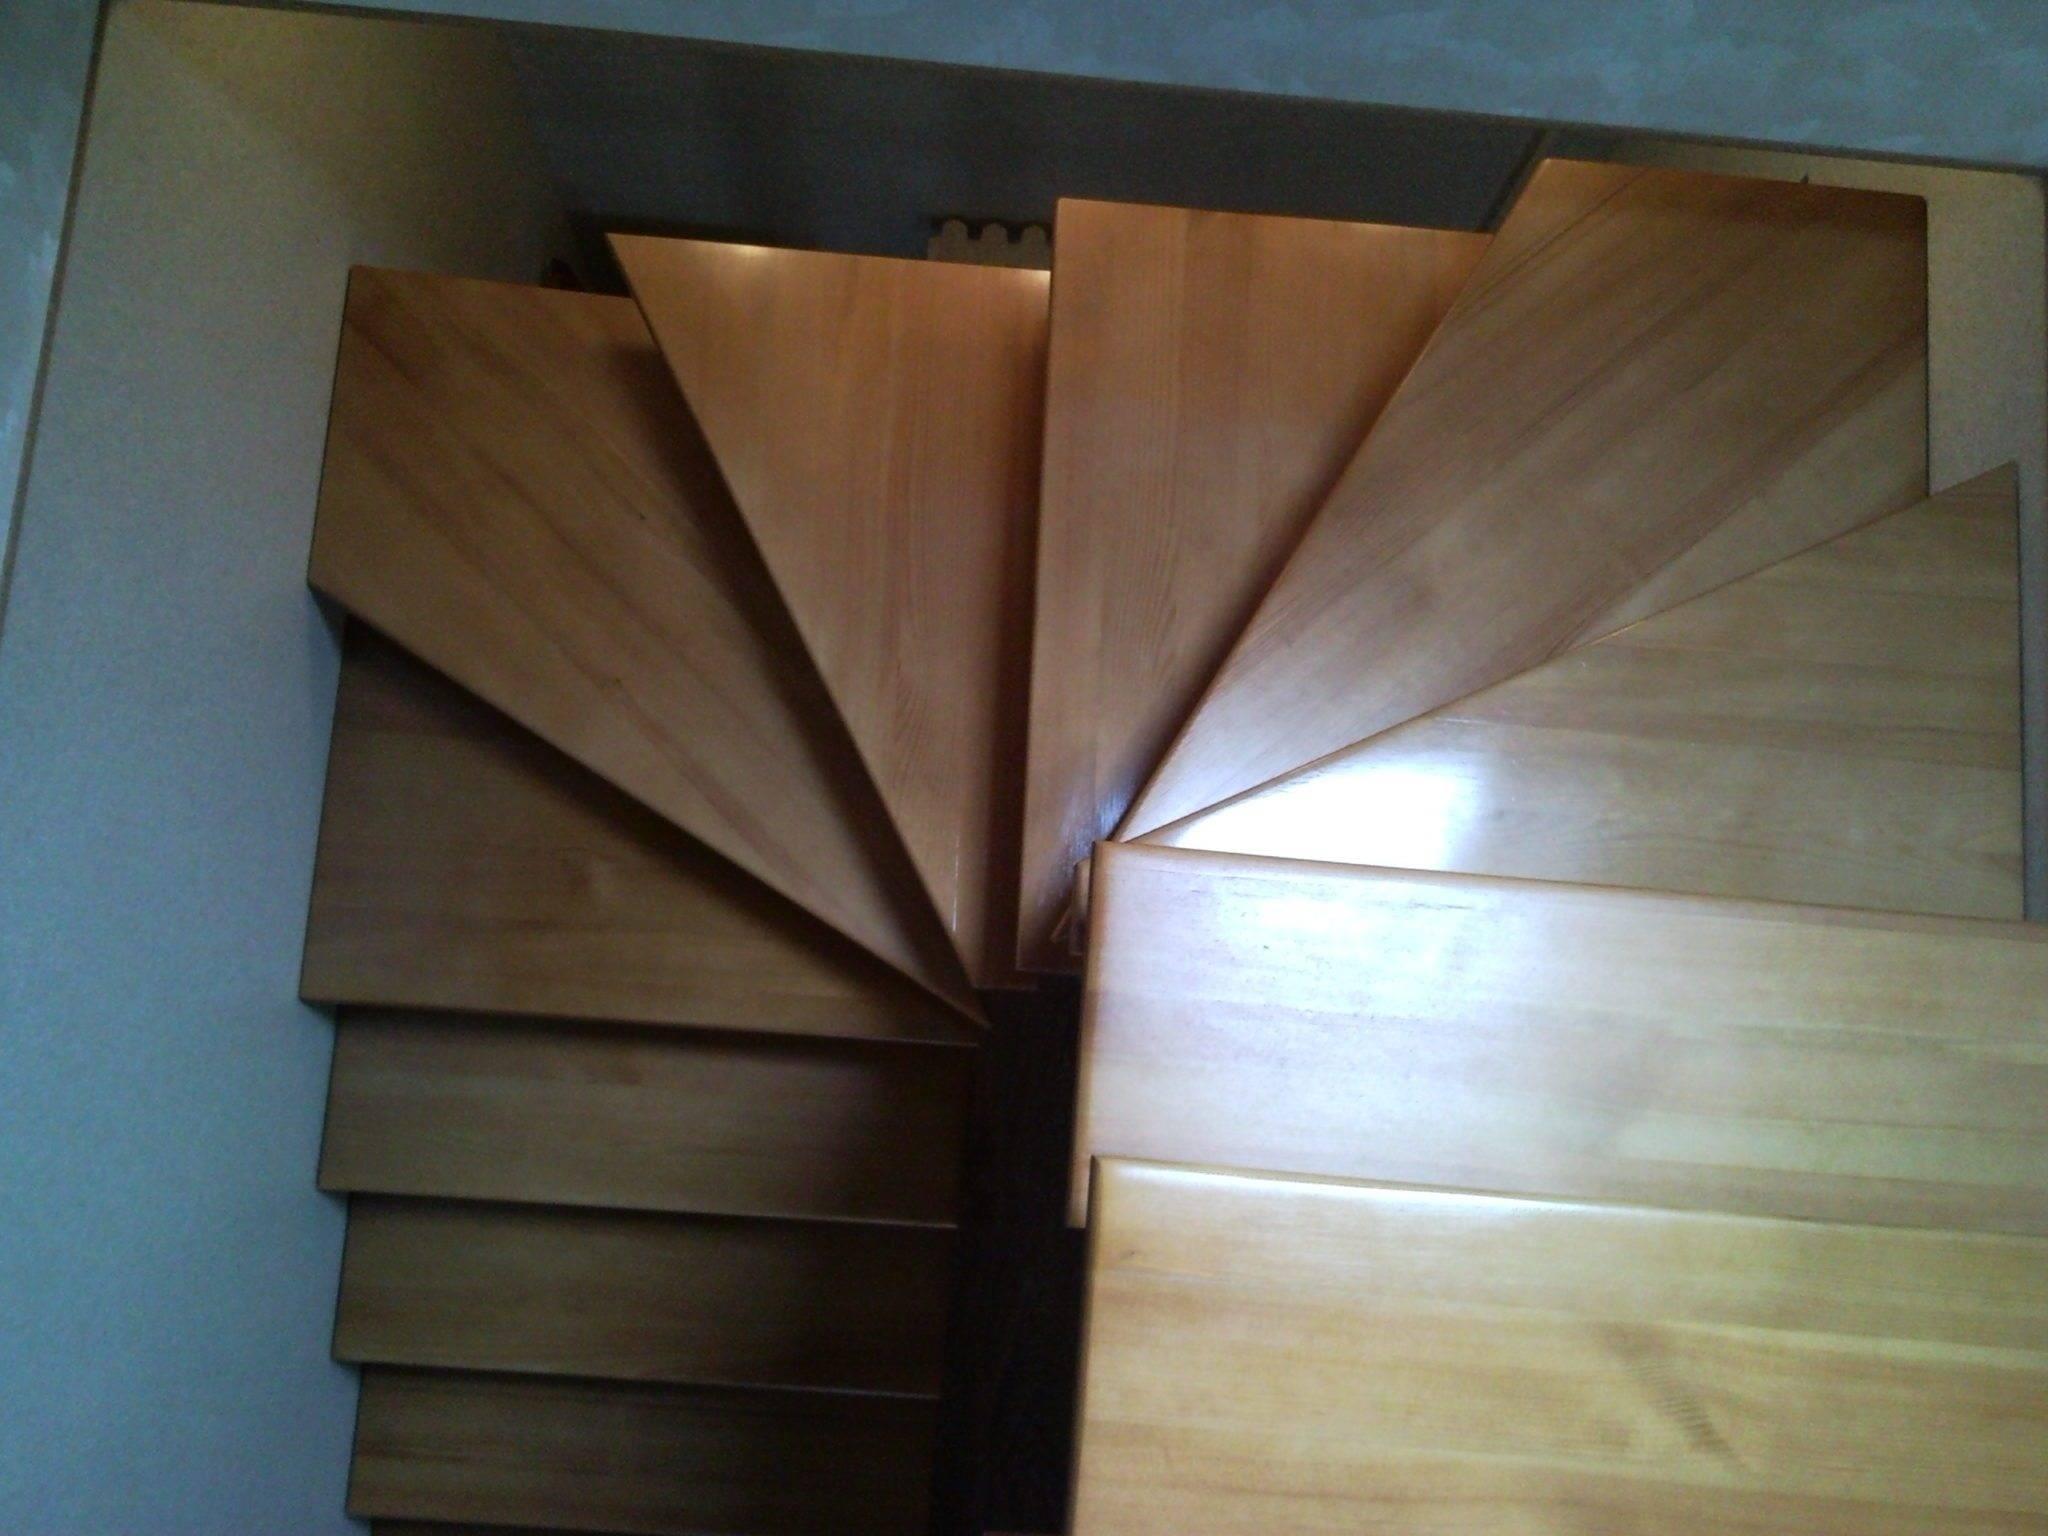 Забежная лестница 180 градусов своими руками фото 537